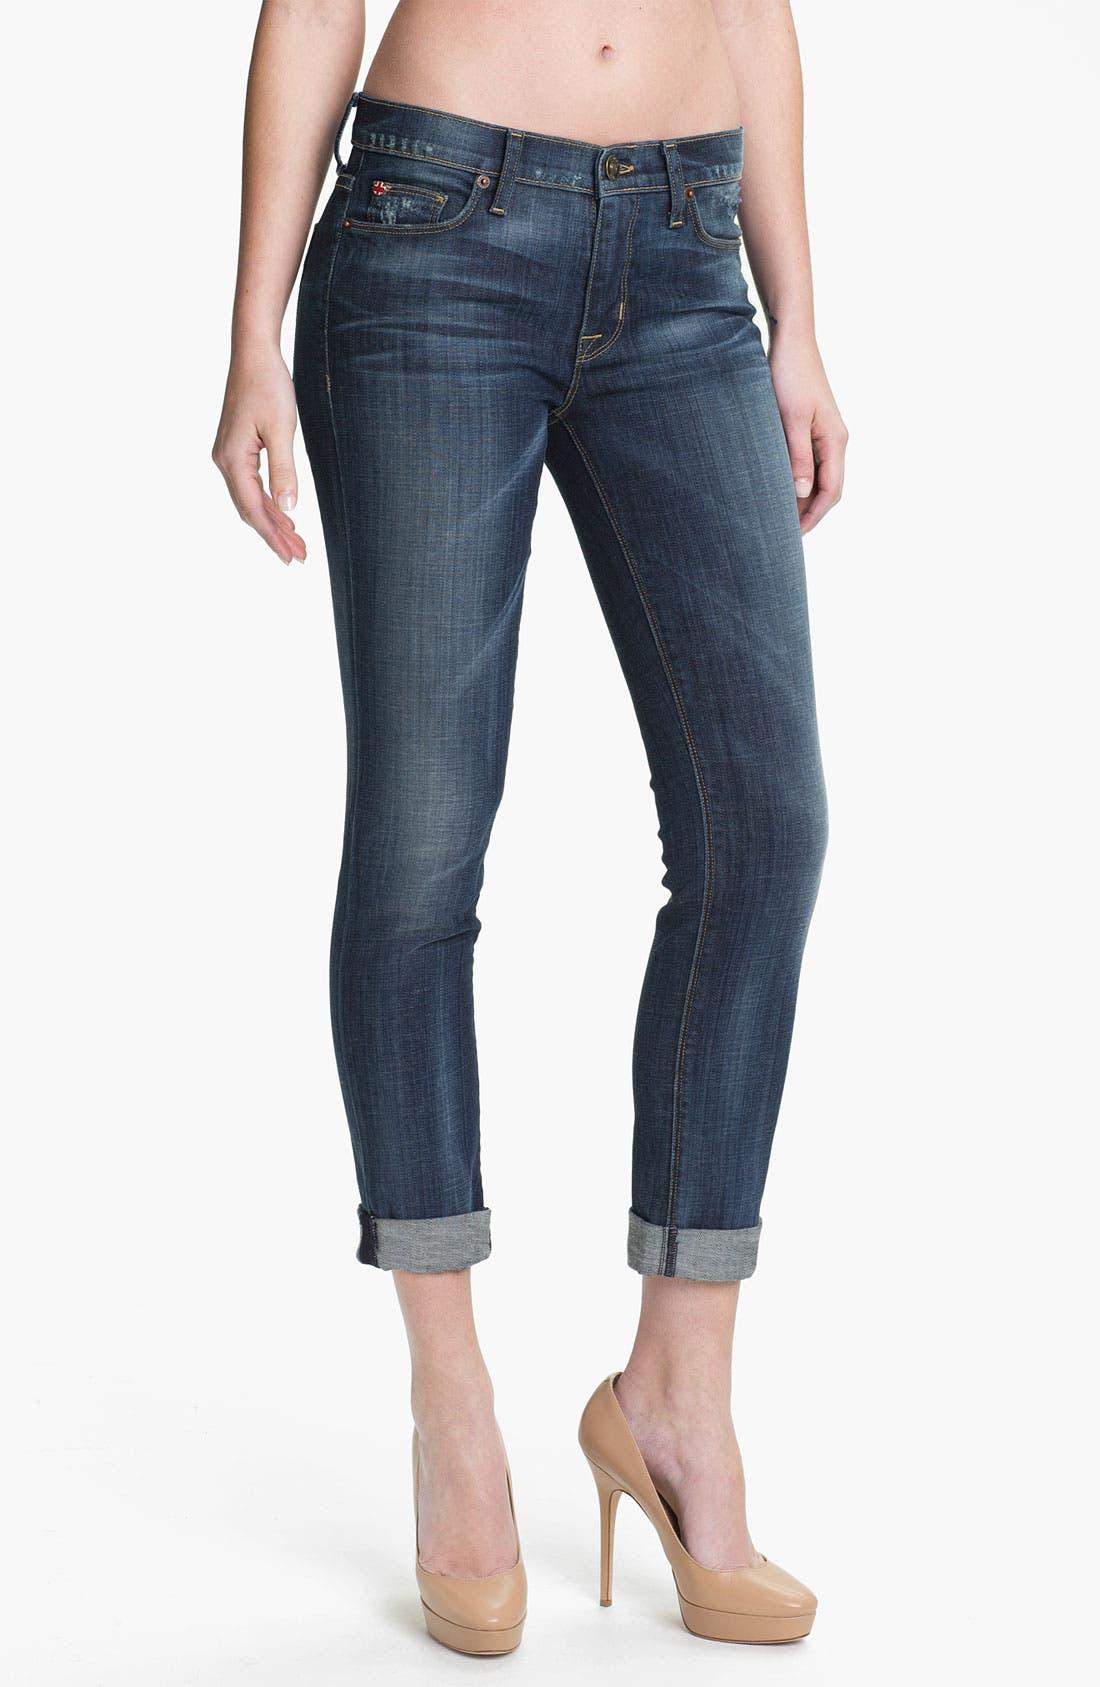 Alternate Image 1 Selected - Hudson Jeans 'Tilda' Cuffed Straight Leg Stretch Jeans (Blue)